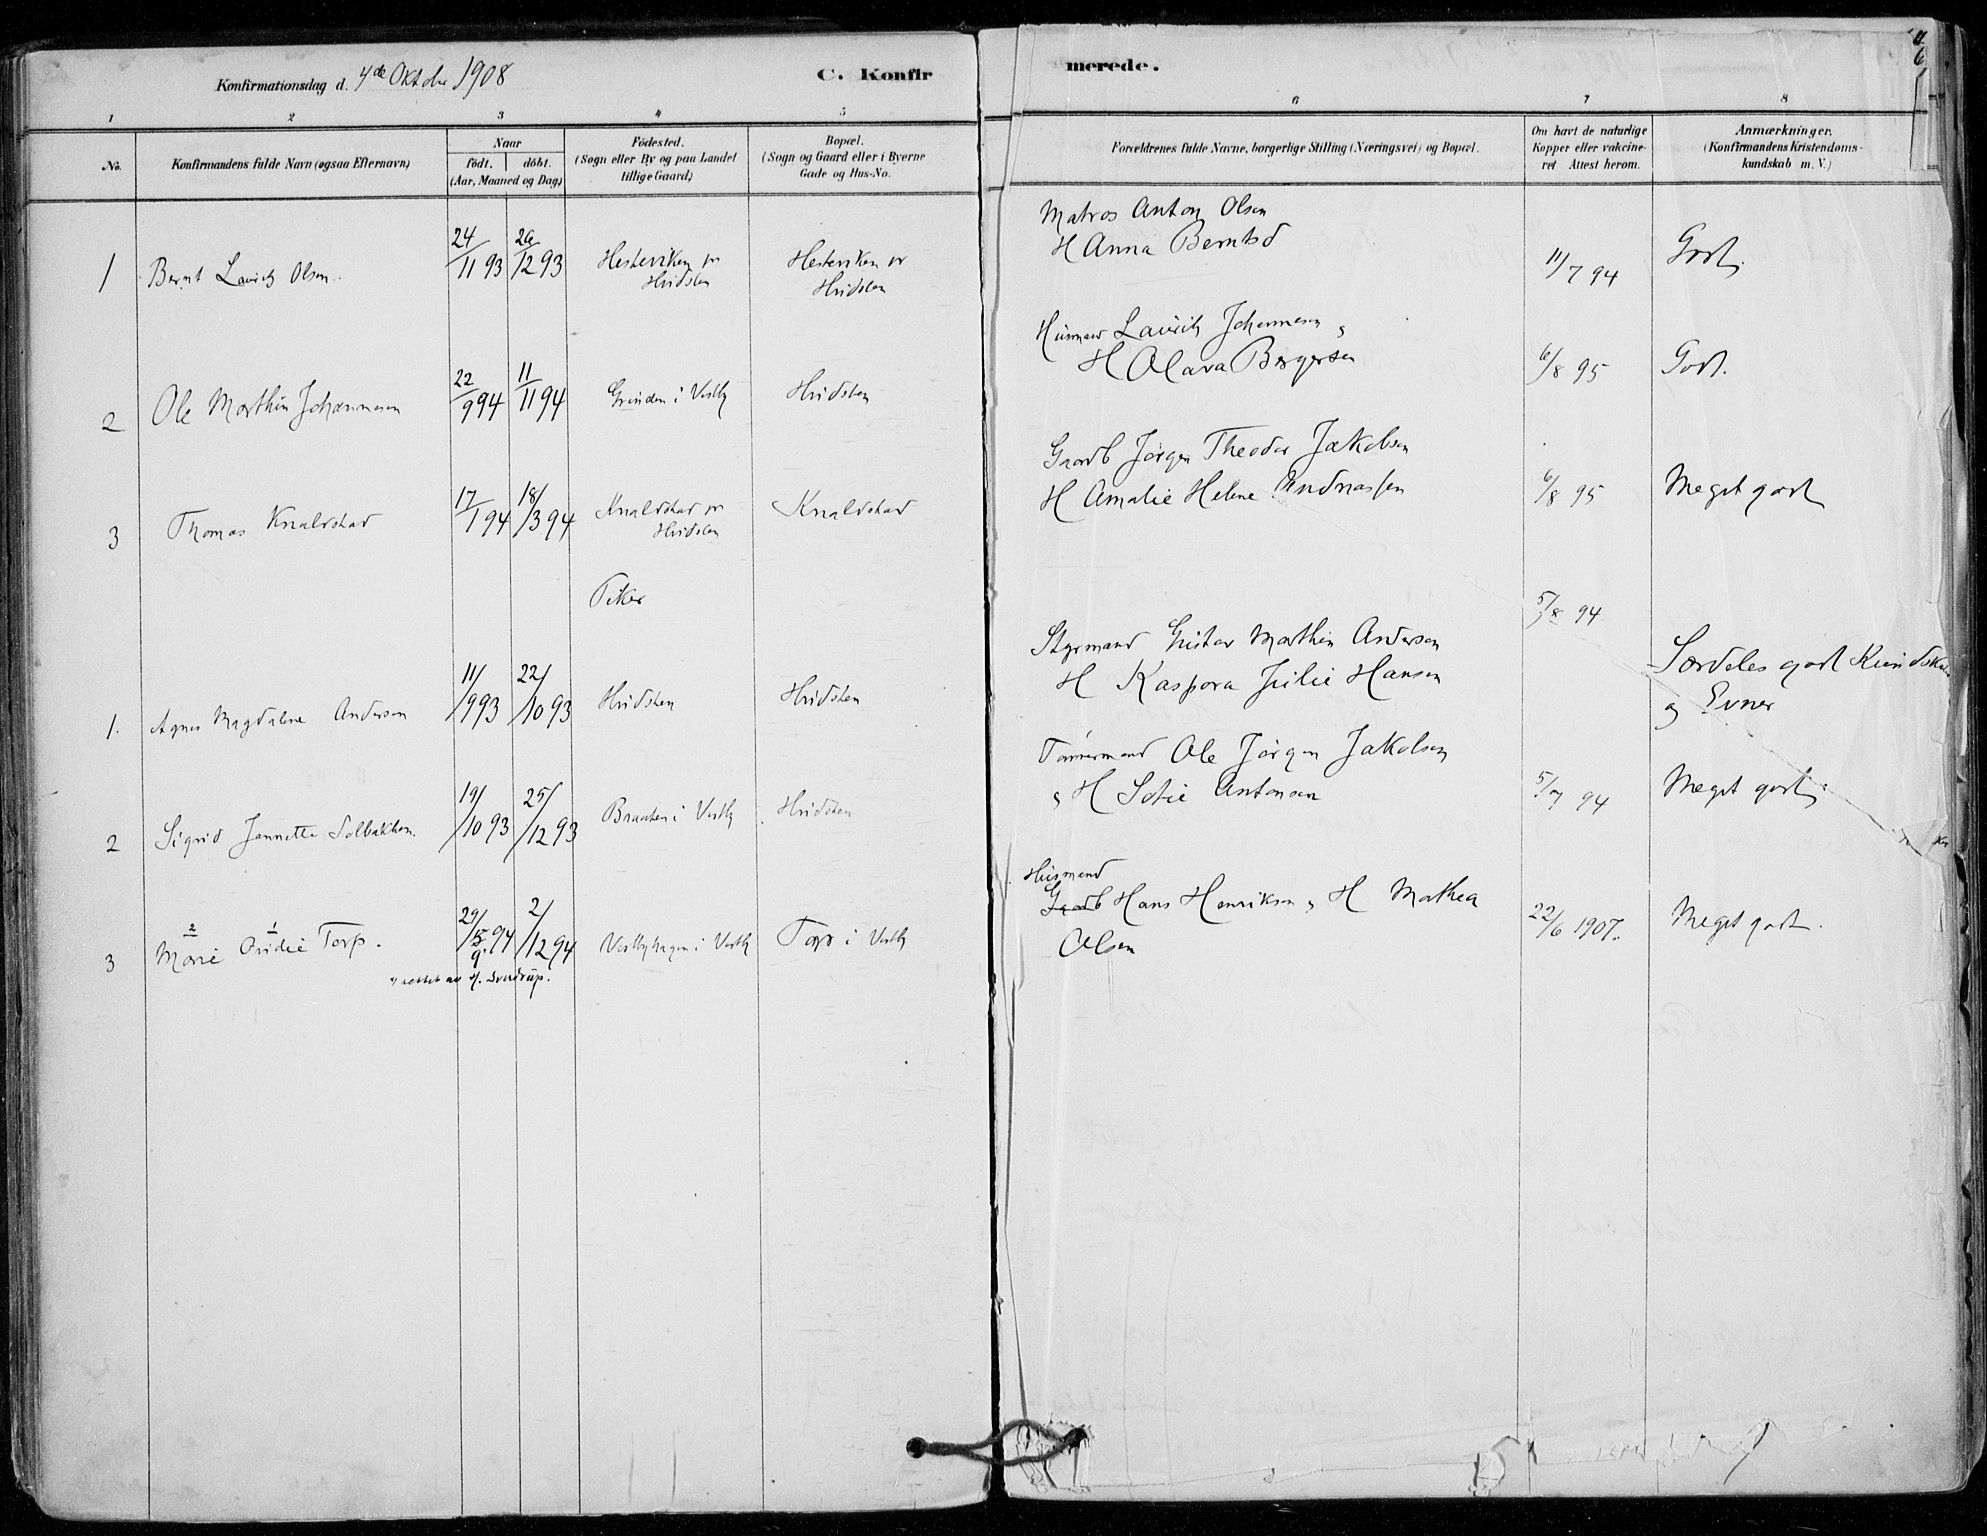 SAO, Vestby prestekontor Kirkebøker, F/Fd/L0001: Ministerialbok nr. IV 1, 1878-1945, s. 63